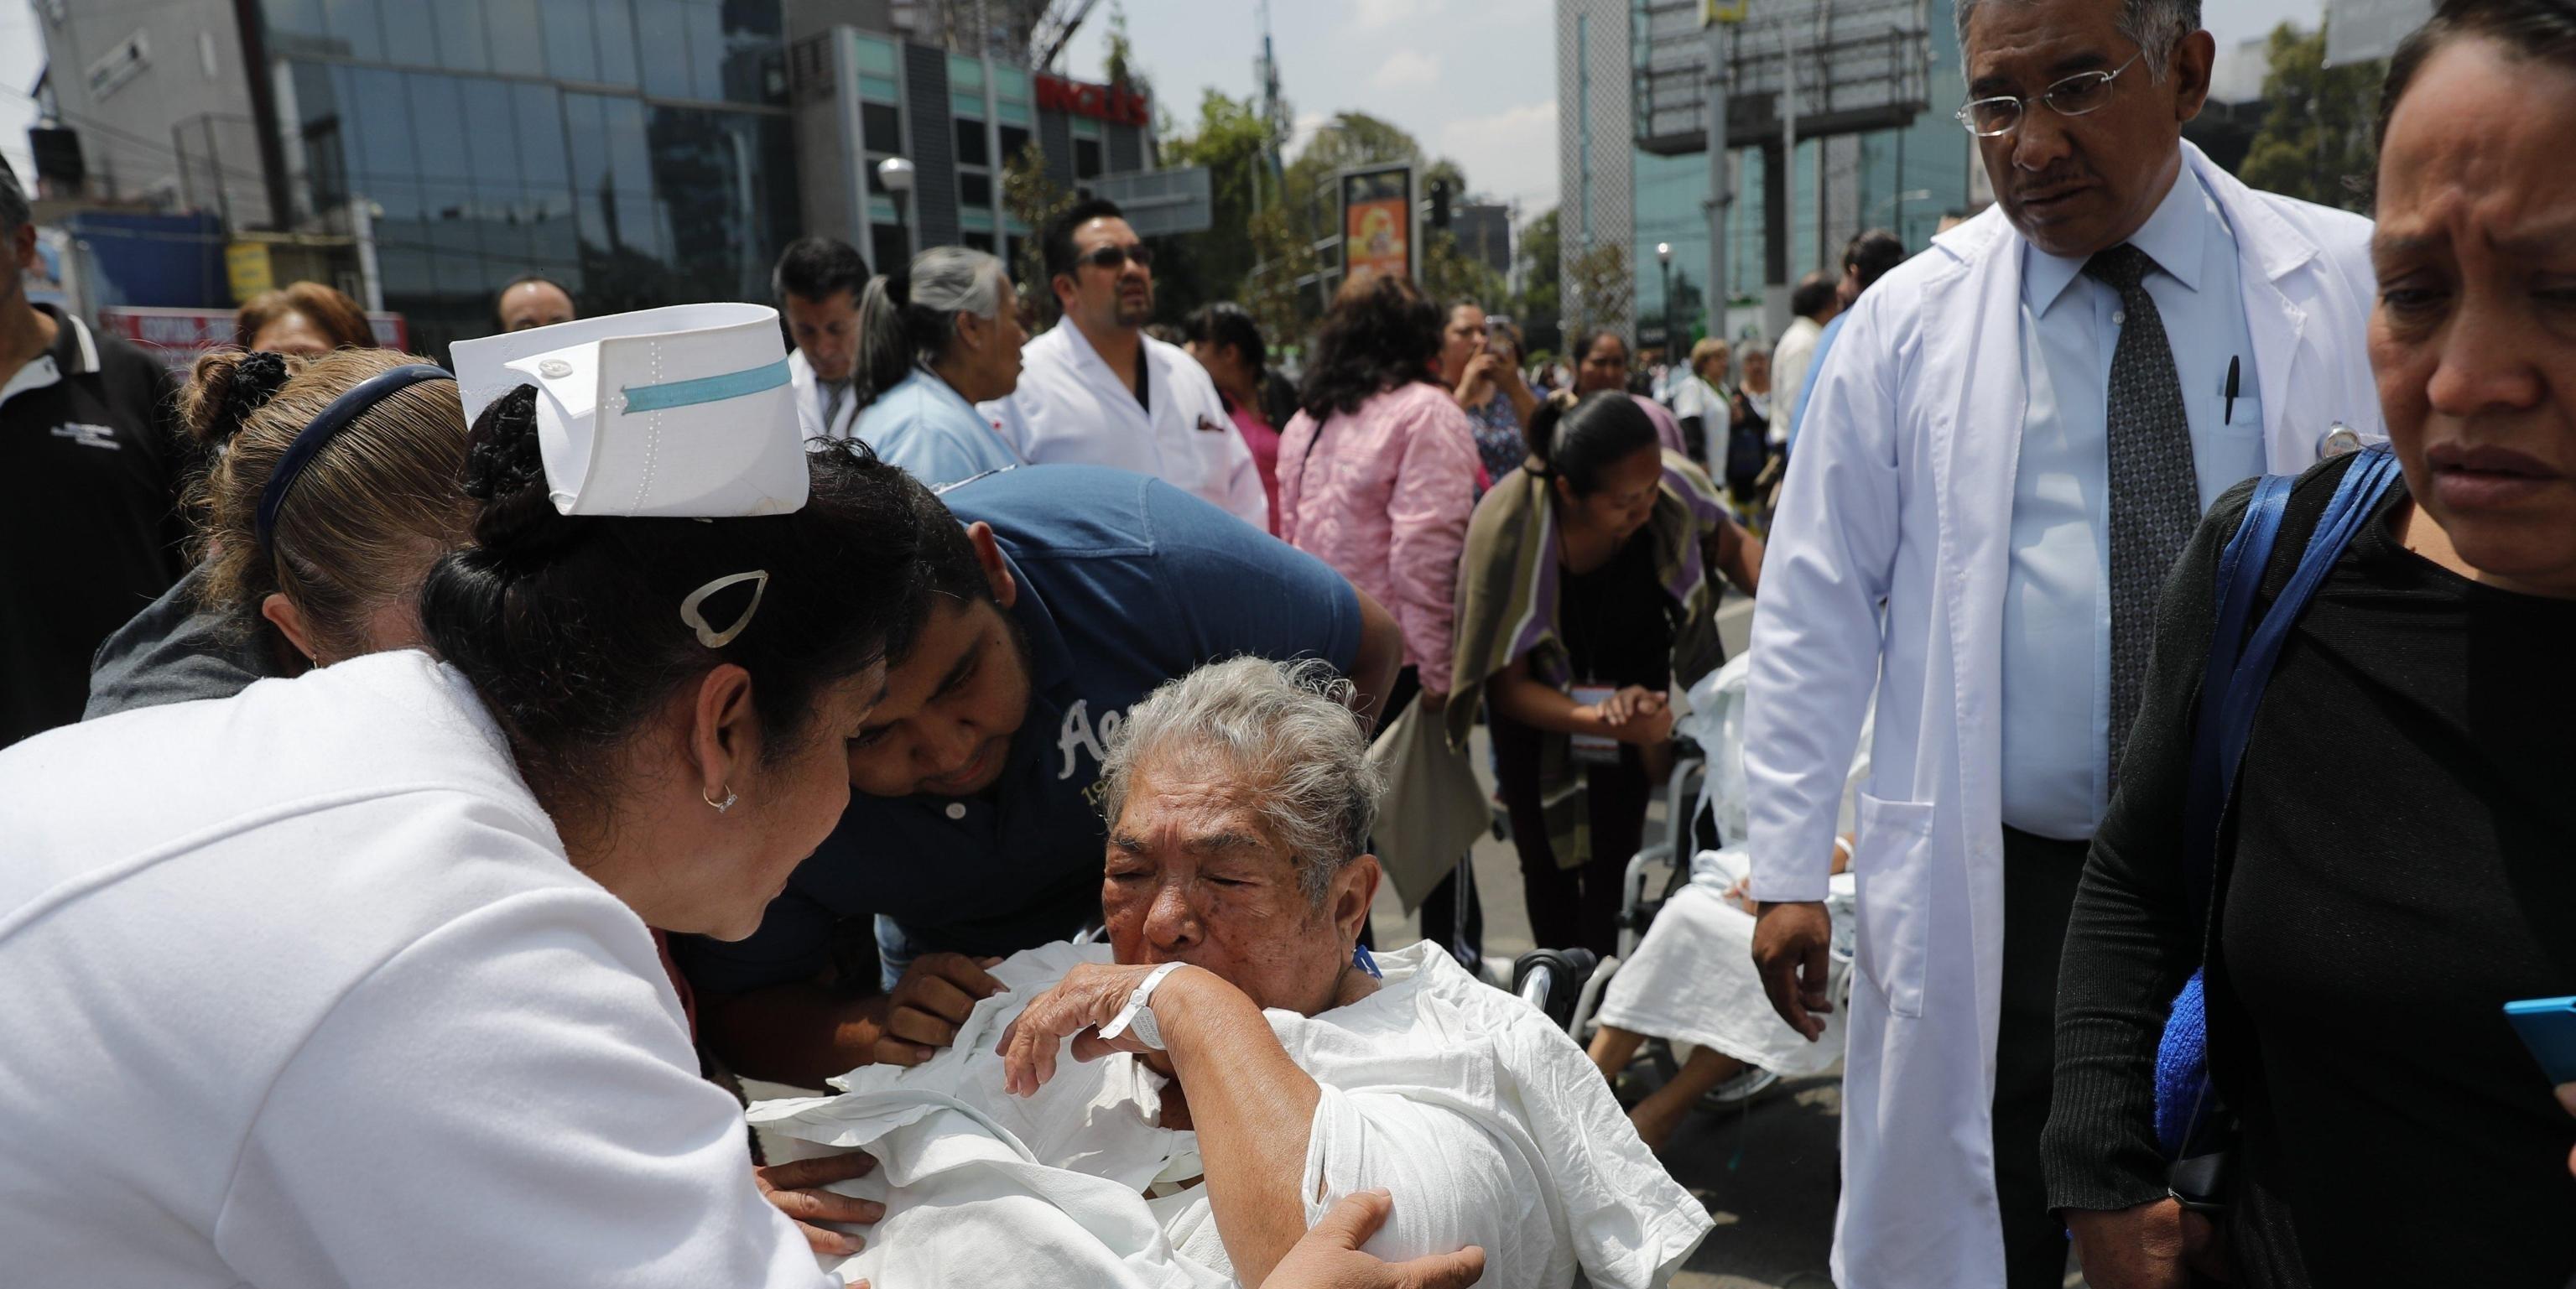 Messico: circa 50 le vittime del sisma